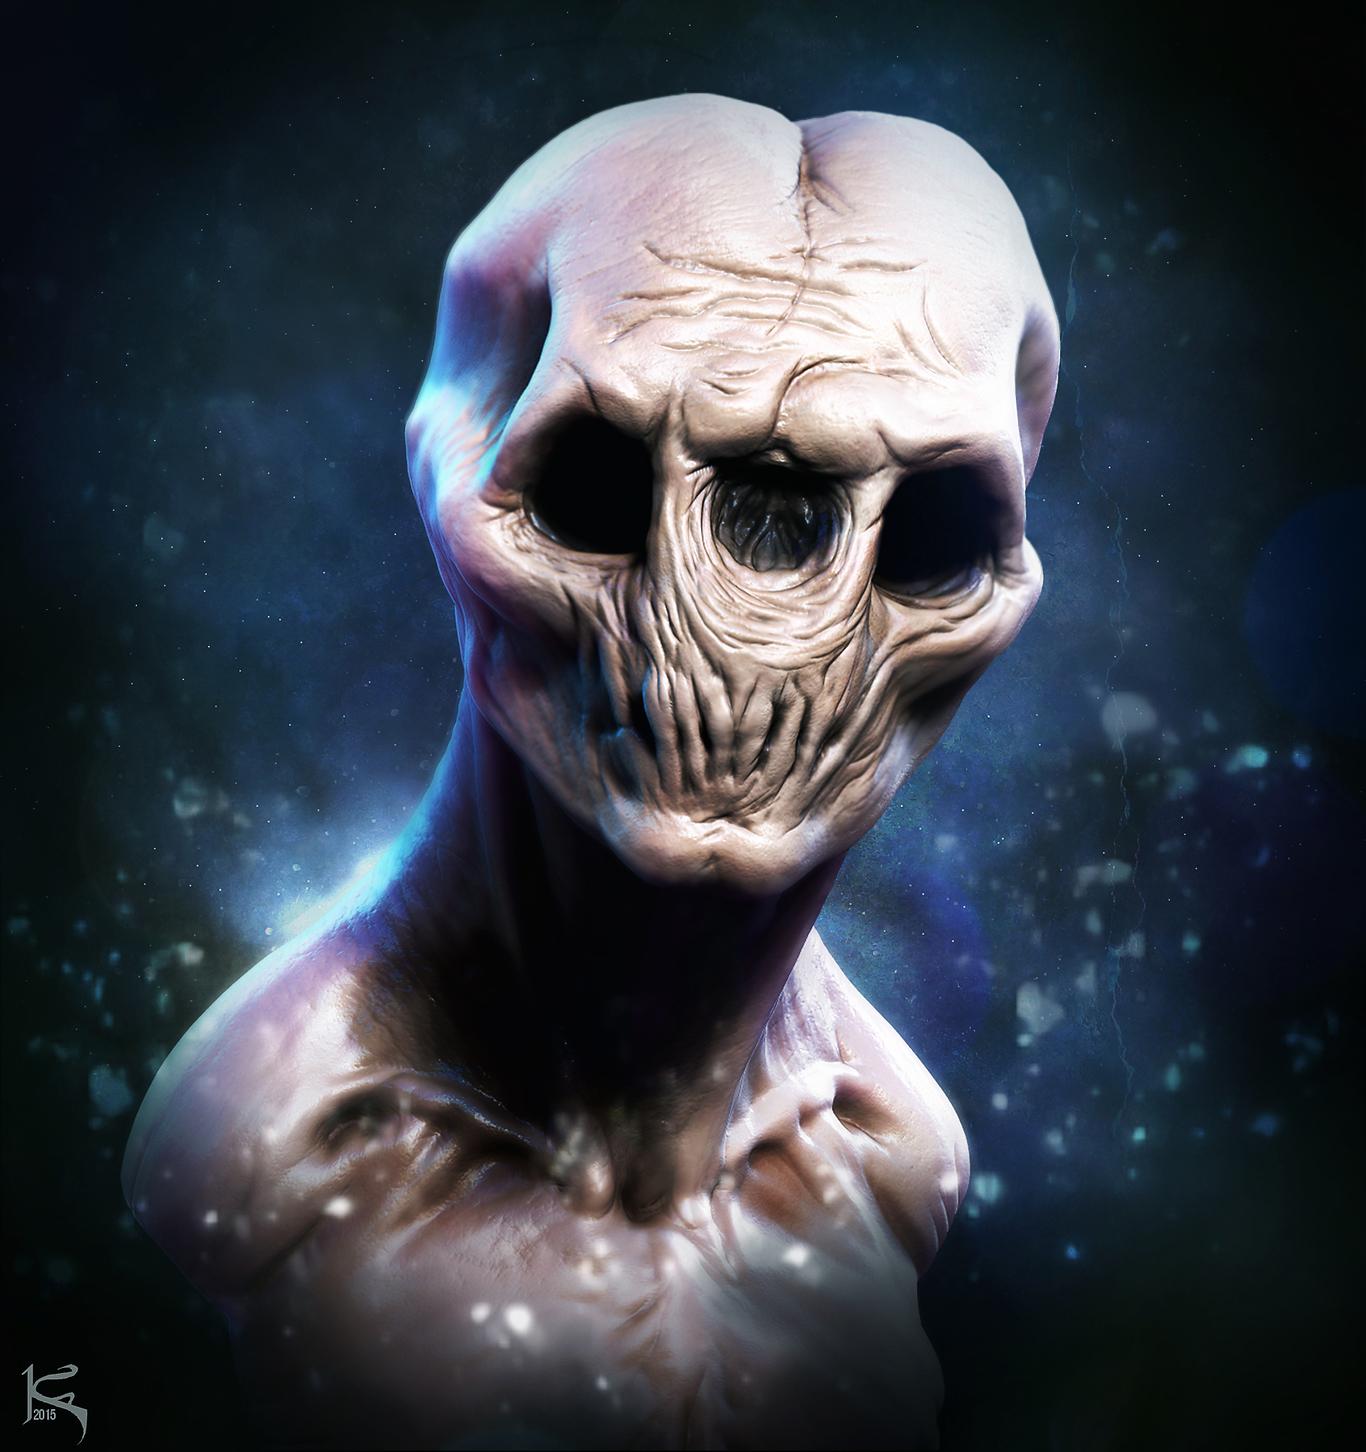 Josh Hardie Fan Art #2- Monster Creature Design Doodle